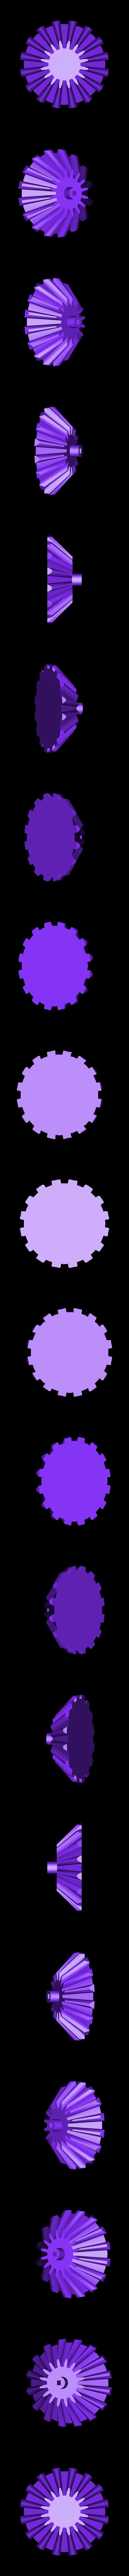 Clockwise Mechanism Gear Front.stl Download STL file Clockwise Mechanism • 3D printer model, Chrisibub